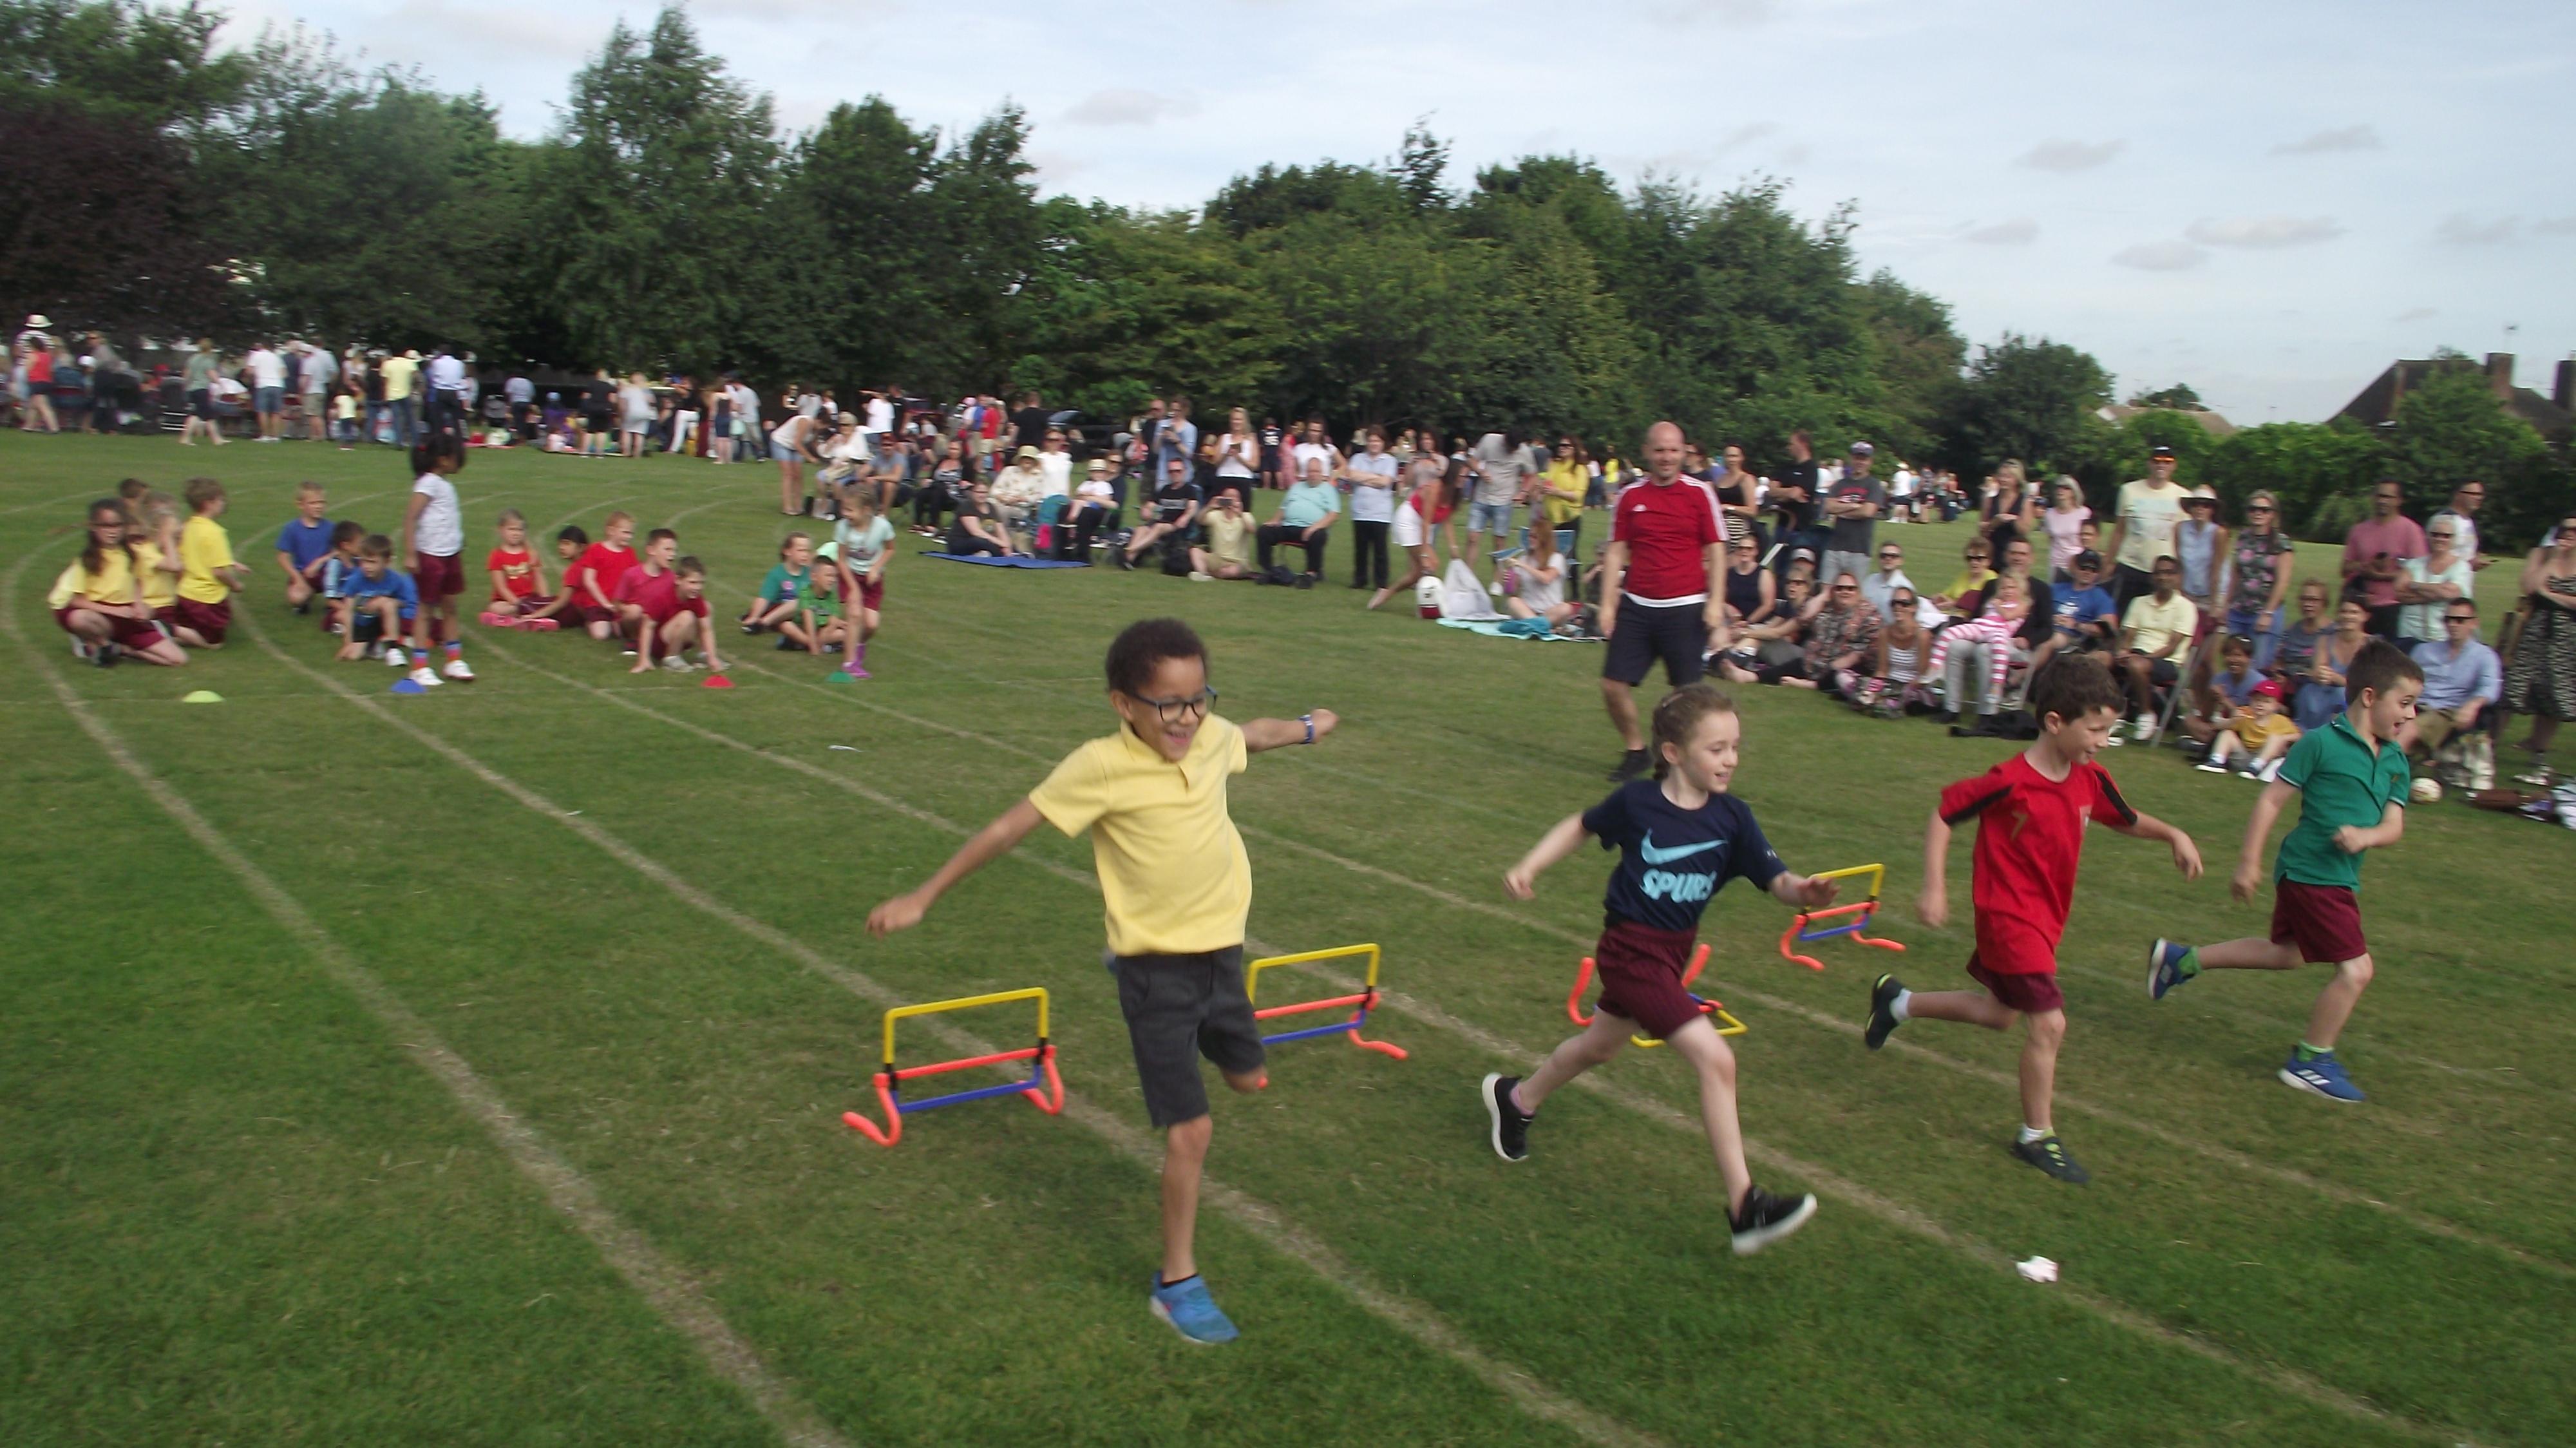 Earls Hall Primary School – Celebrate, Challenge, Achieve